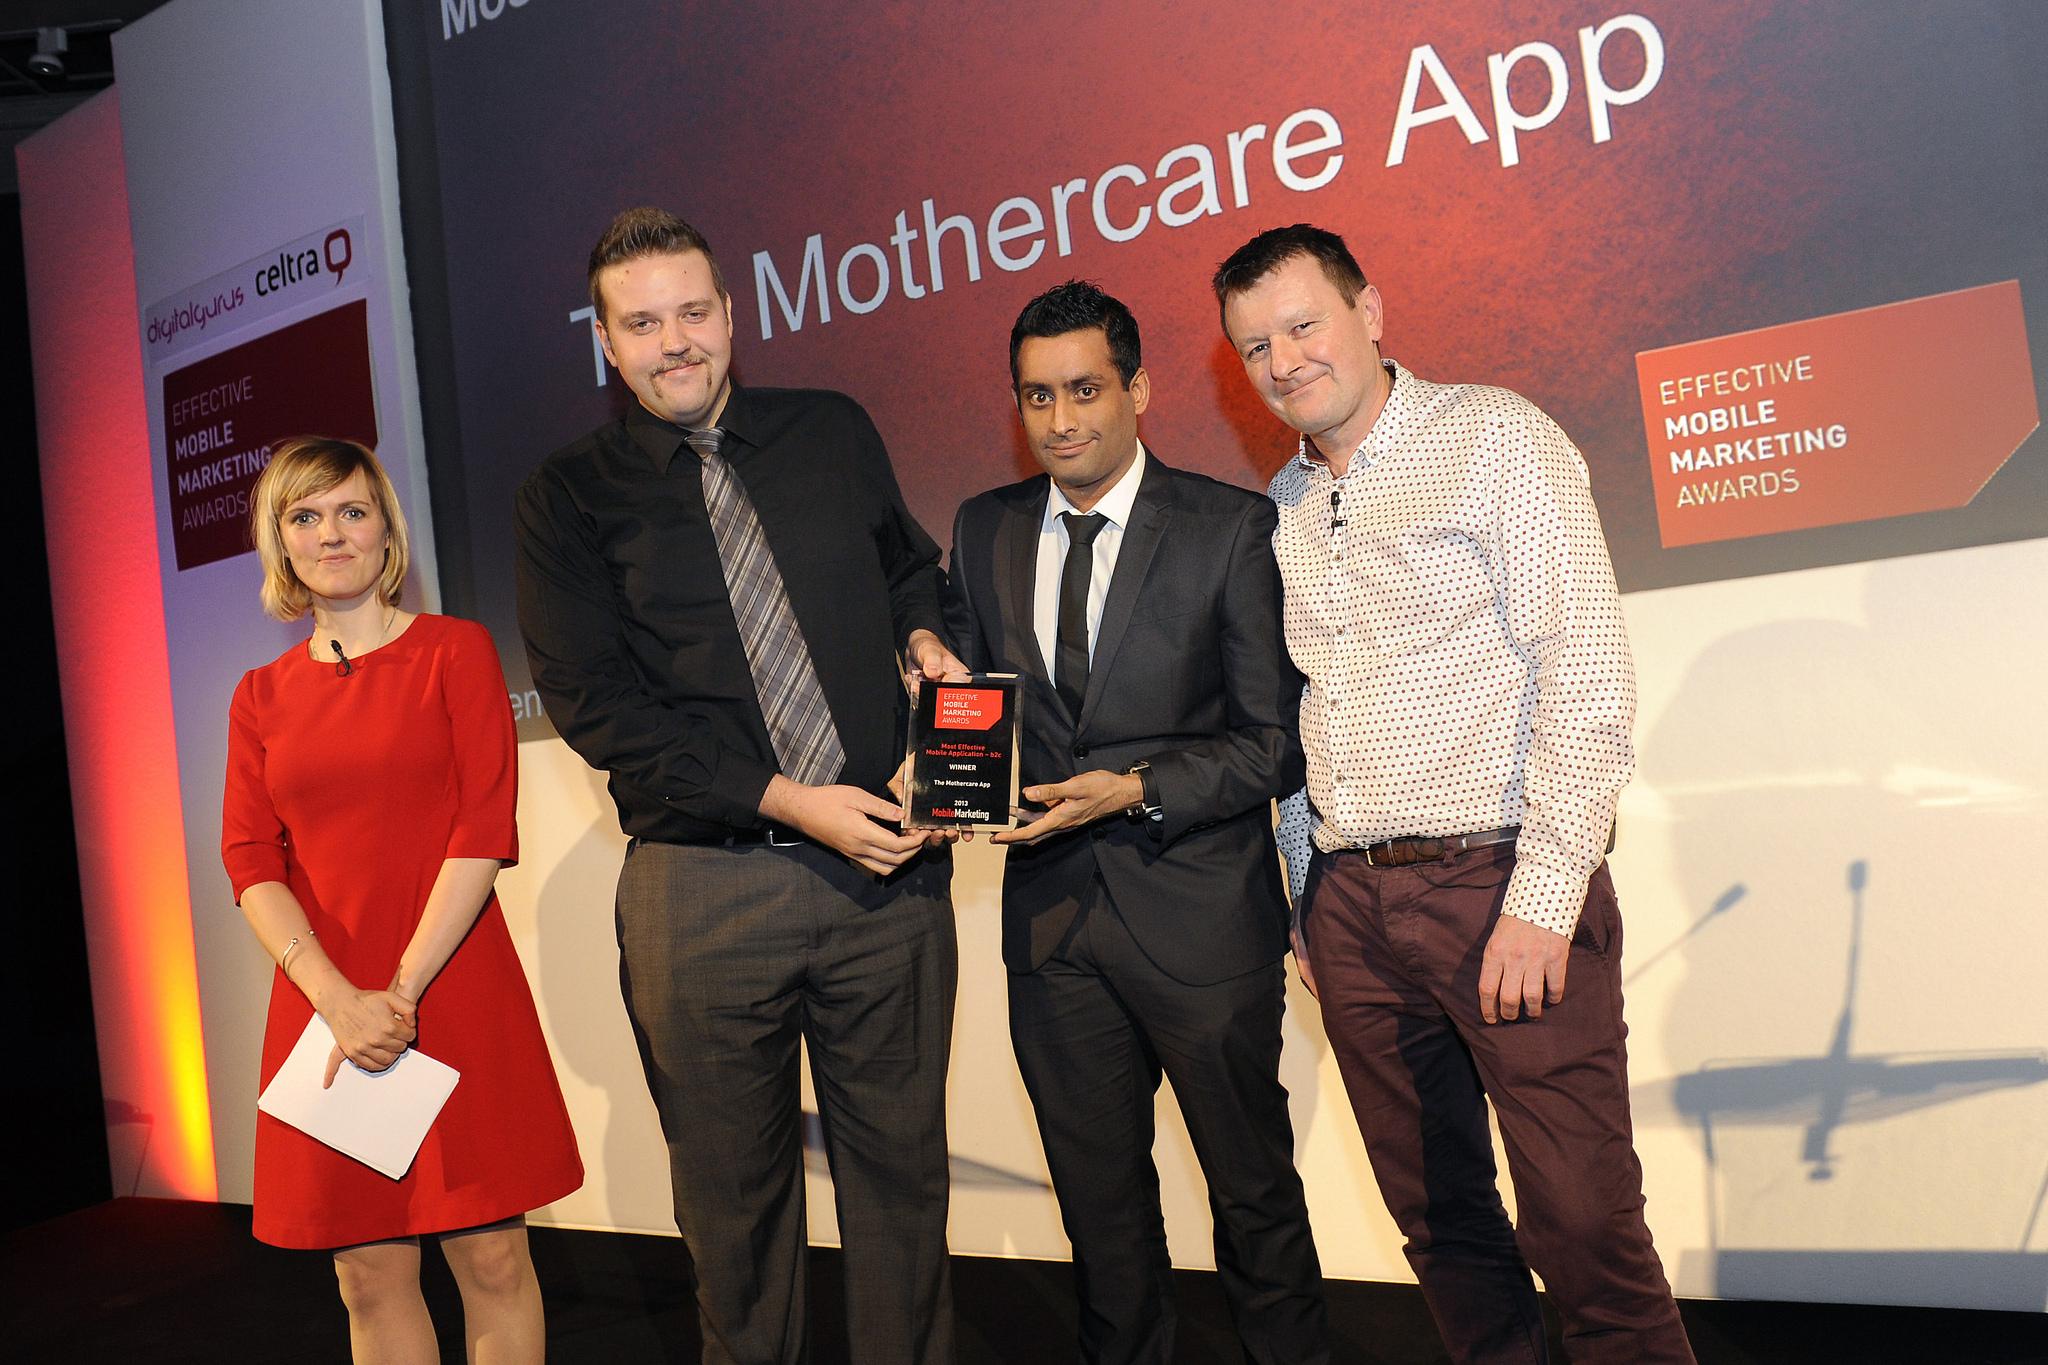 Effective Mobile Marketing Awards – Last Year's Winners: b2c App